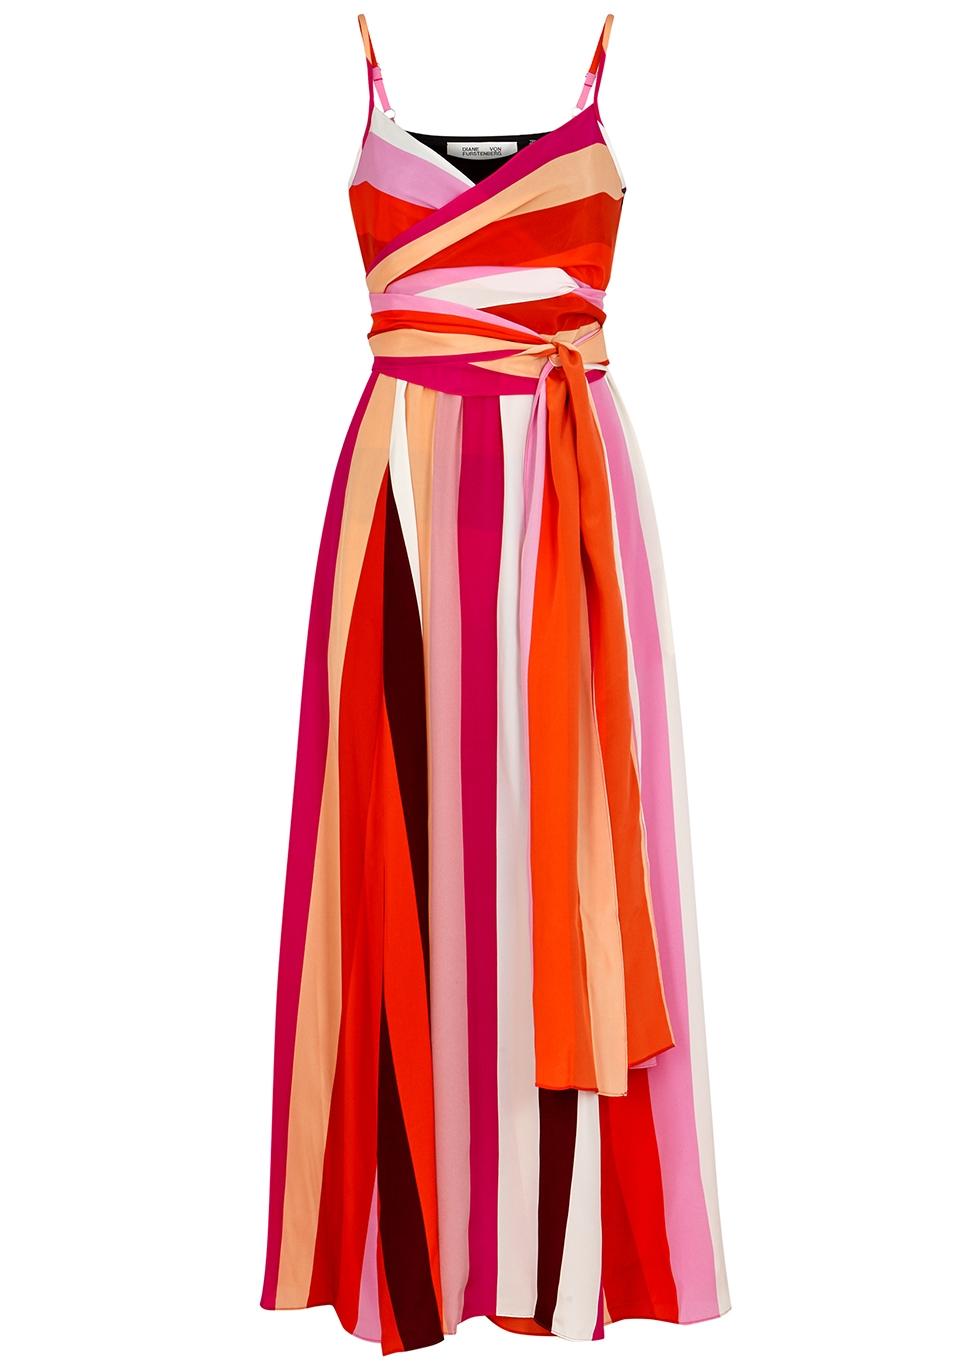 911d8b4ca9cb Diane von Furstenberg Dresses